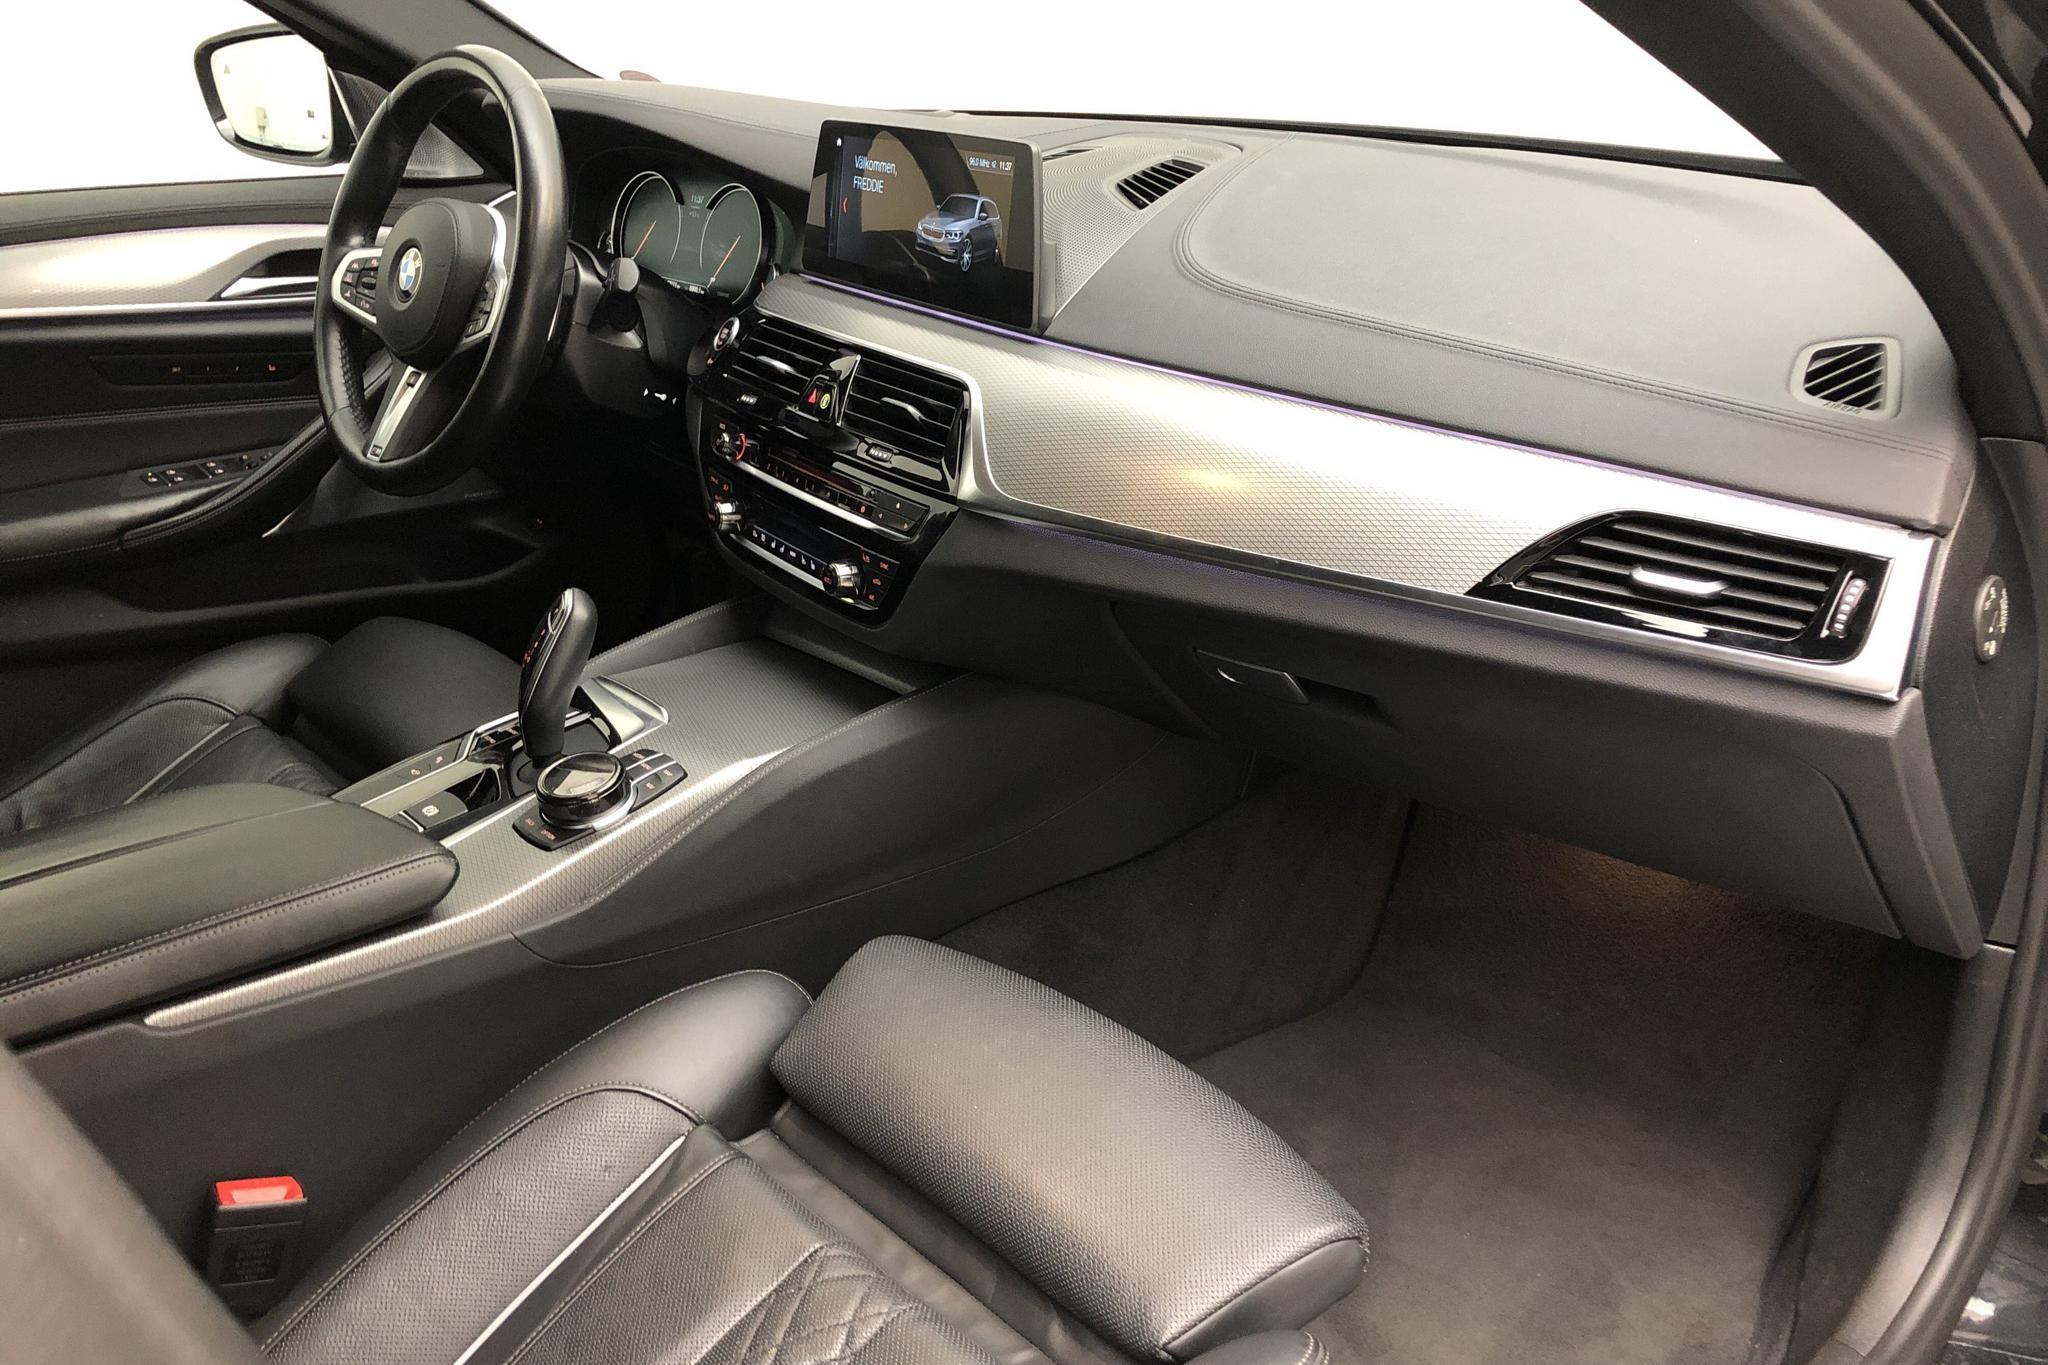 BMW 540i xDrive Touring, G31 (340hk) - 5 211 mil - Automat - svart - 2018